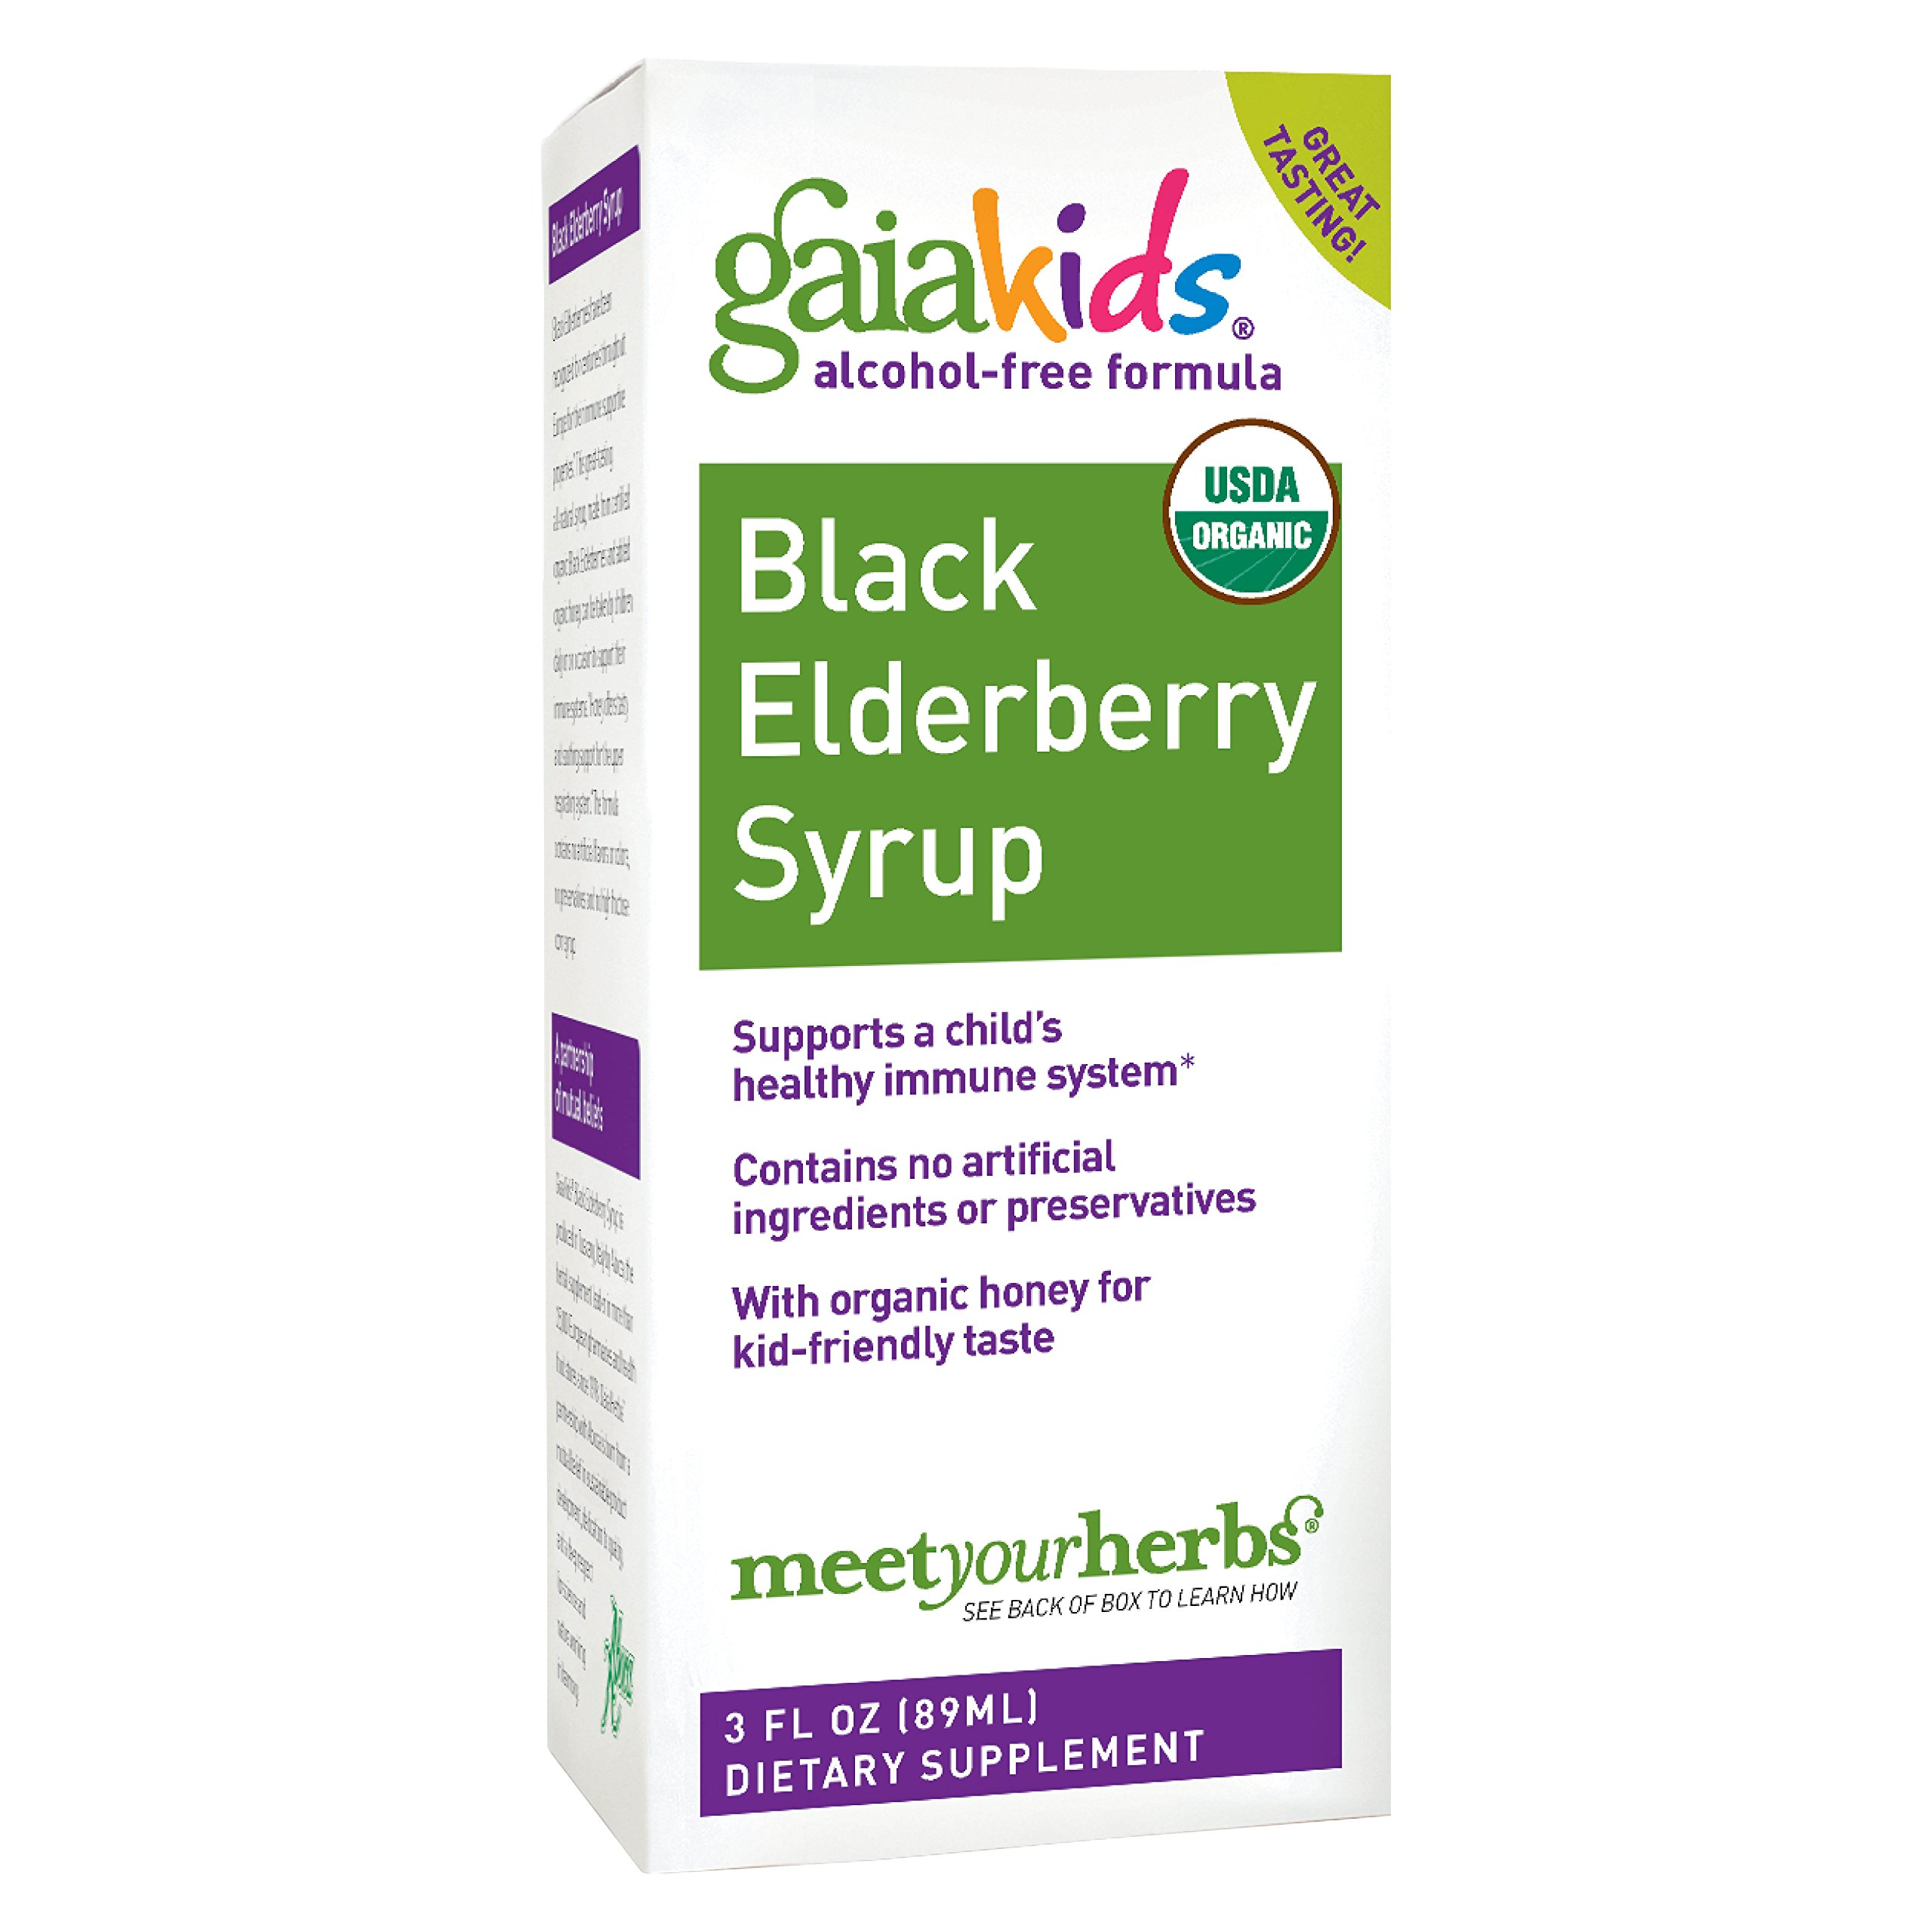 Gaia Herbs GaiaKids Black Elderberry Syrup, 3 Ounce - Daily Sambucus Black Elderberry Immune Support for Kids, Organic Whole Food Formula